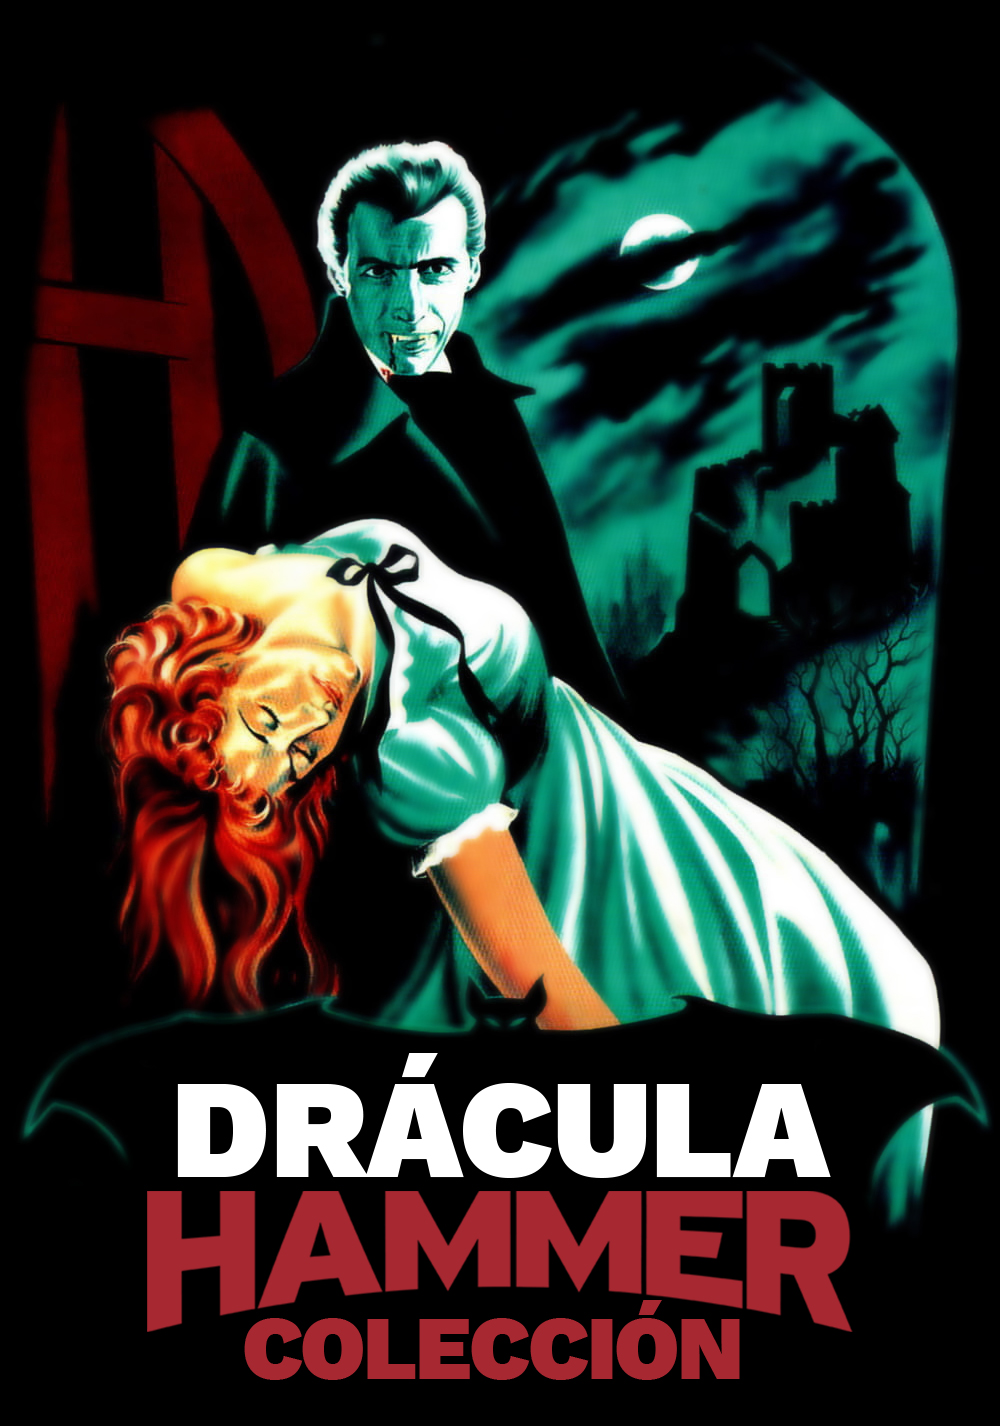 Dracula Hammer